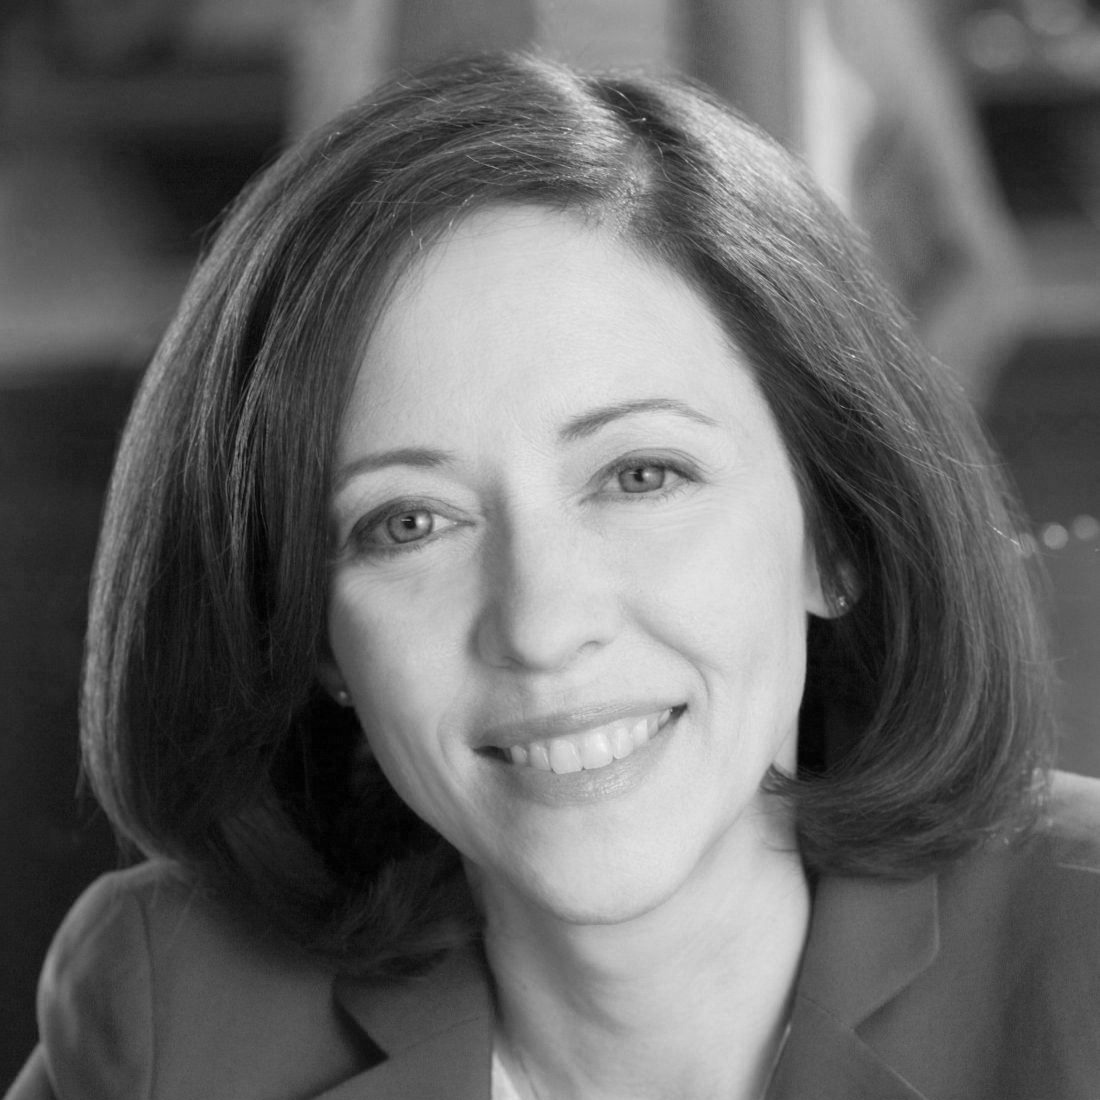 Senator Maria Cantwell - United States Senator for the State of Washington